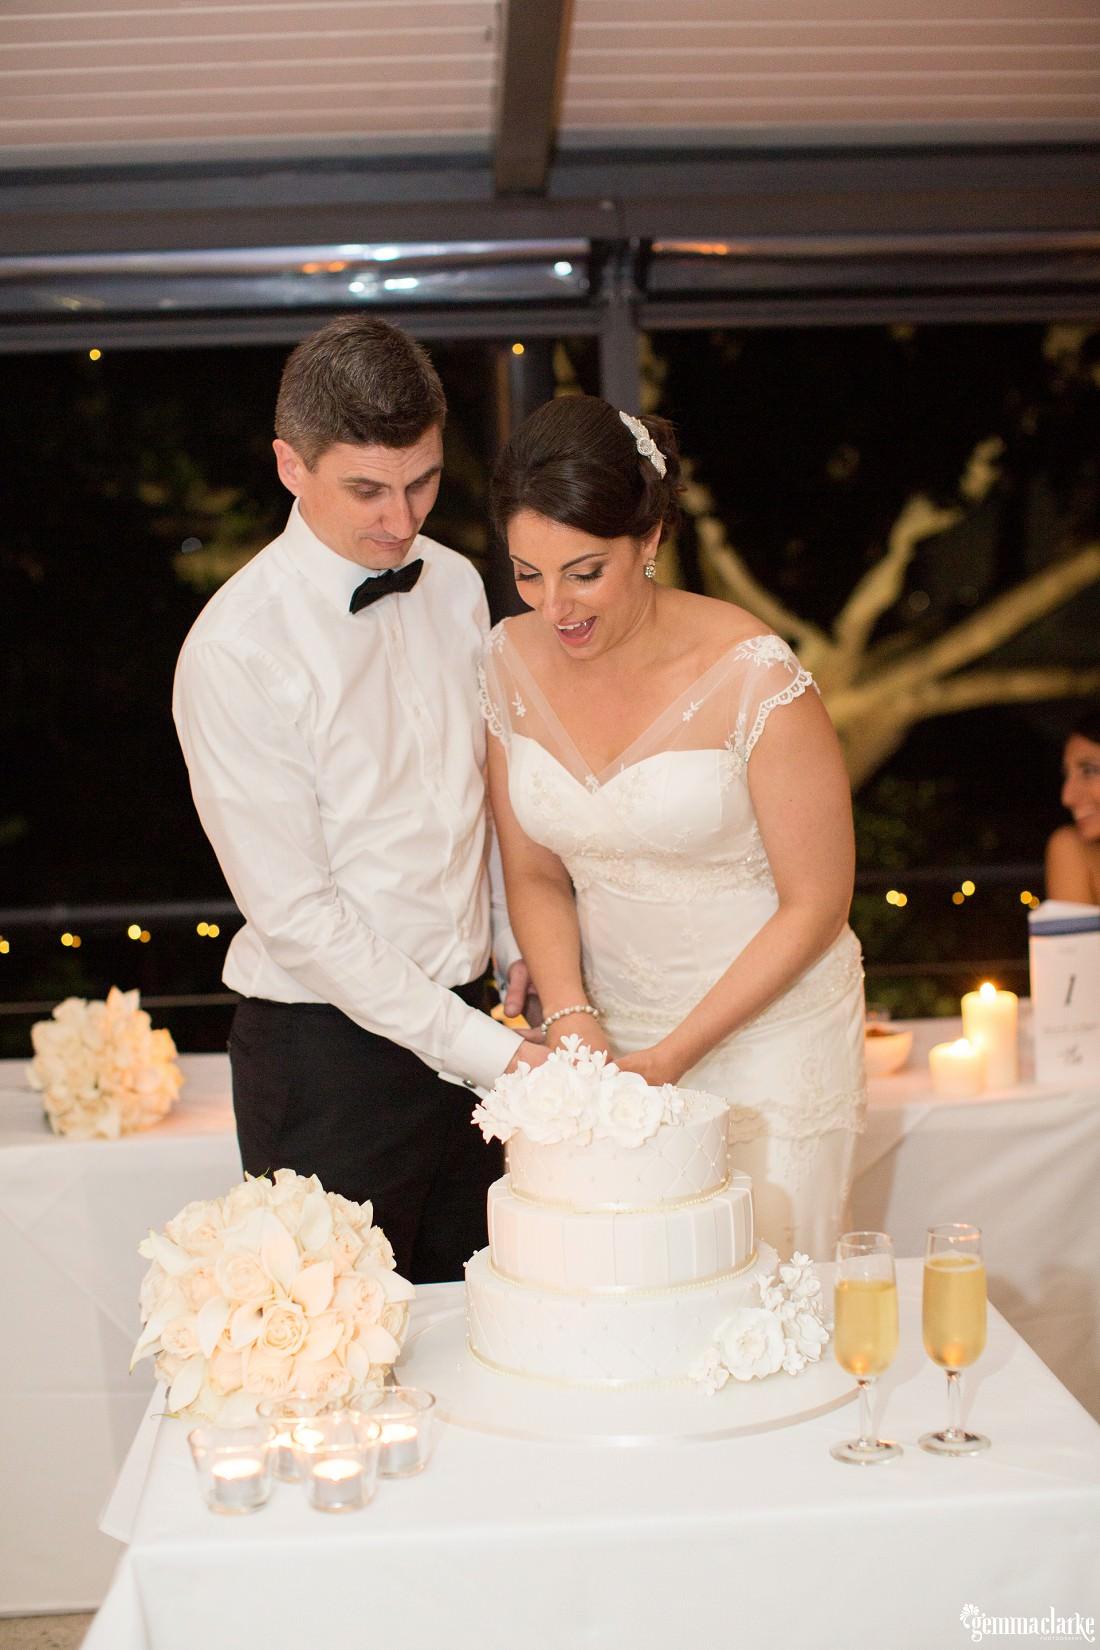 gemma-clarke-photography_botanic-gardens-wedding-reception_amanda-and-dylan_0064